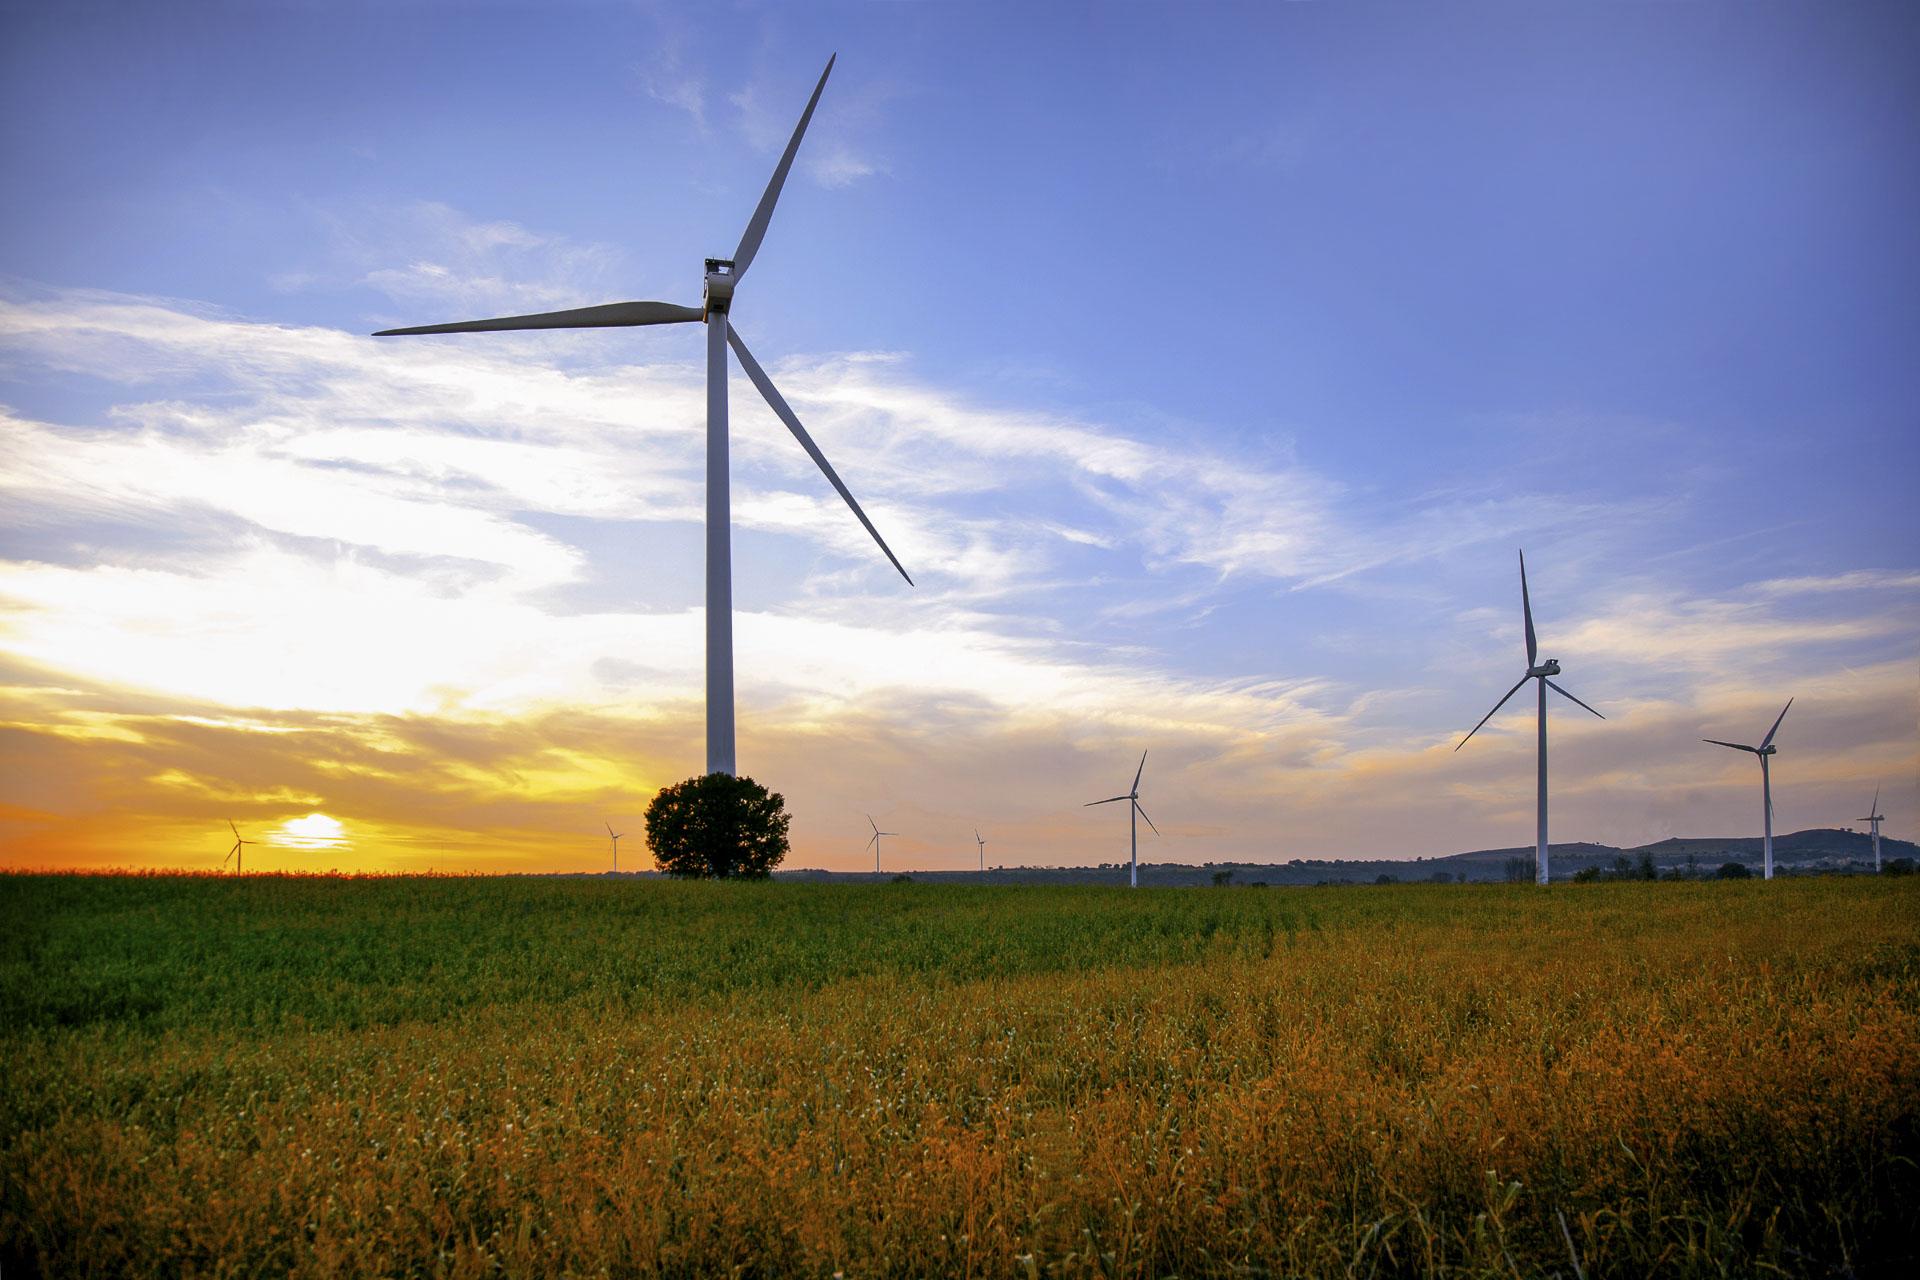 Parco produzione energia verde rinnovabile eolica Piansano